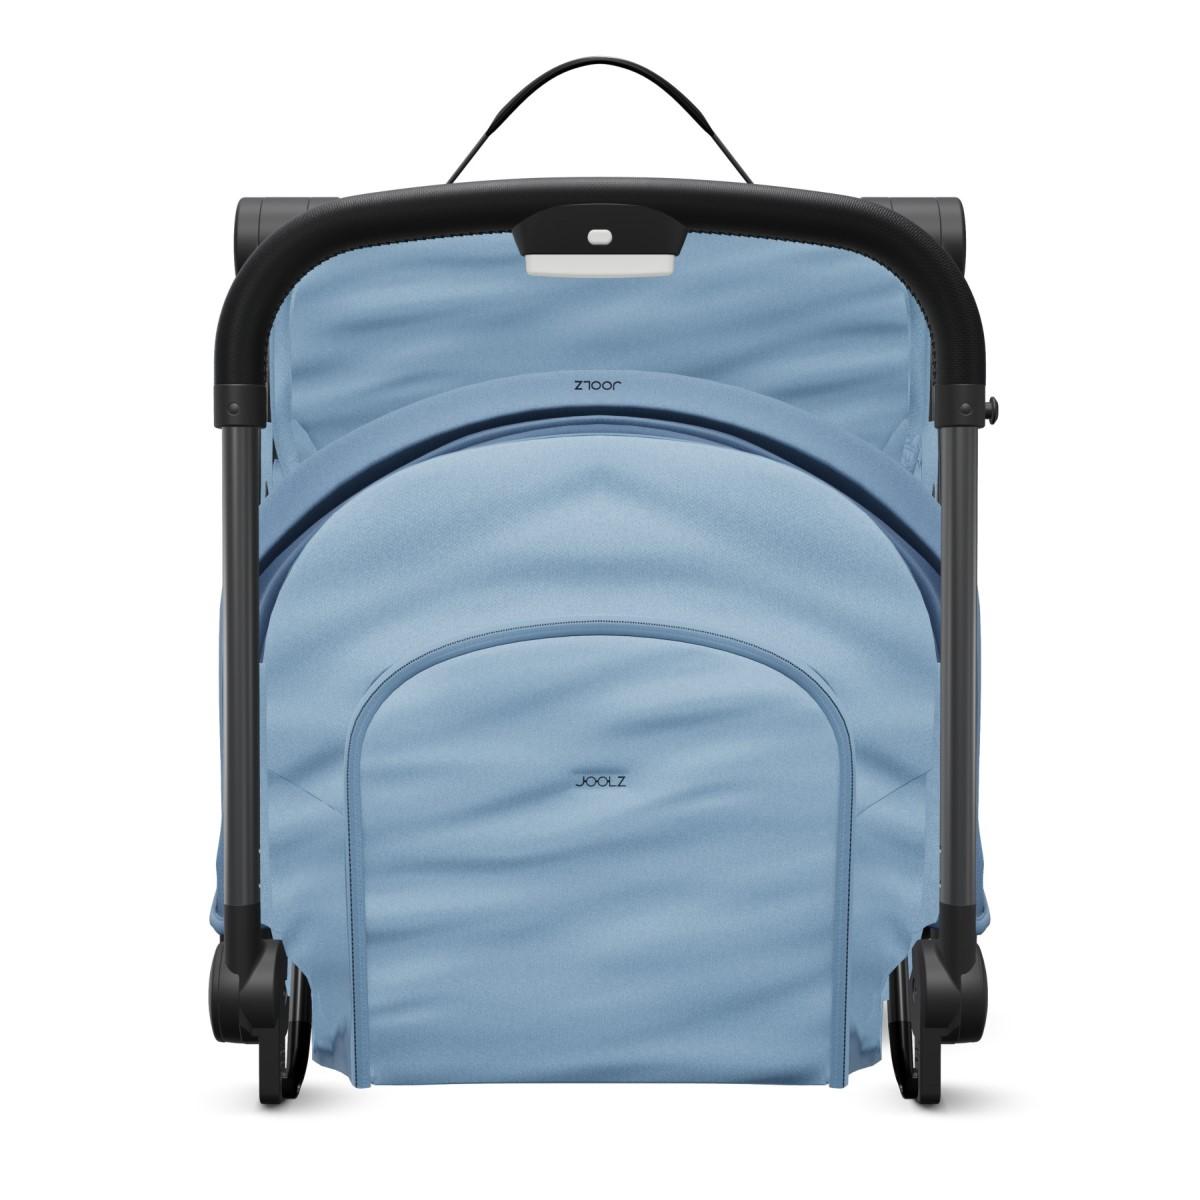 96232-SILLA PASEO JOOLZ AER SPLENDID BLUE(0-0)-3